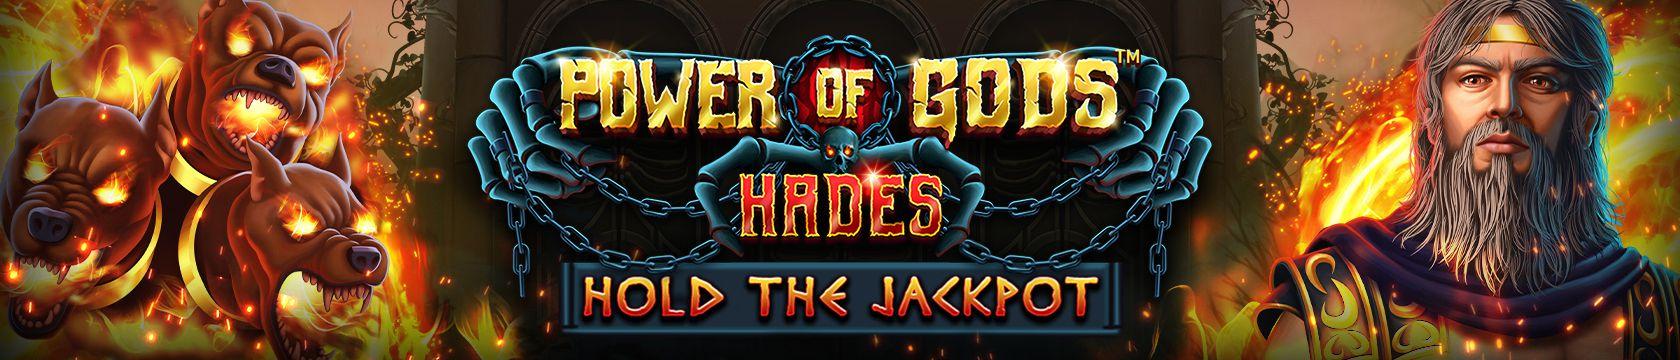 Power of Gods: Hades